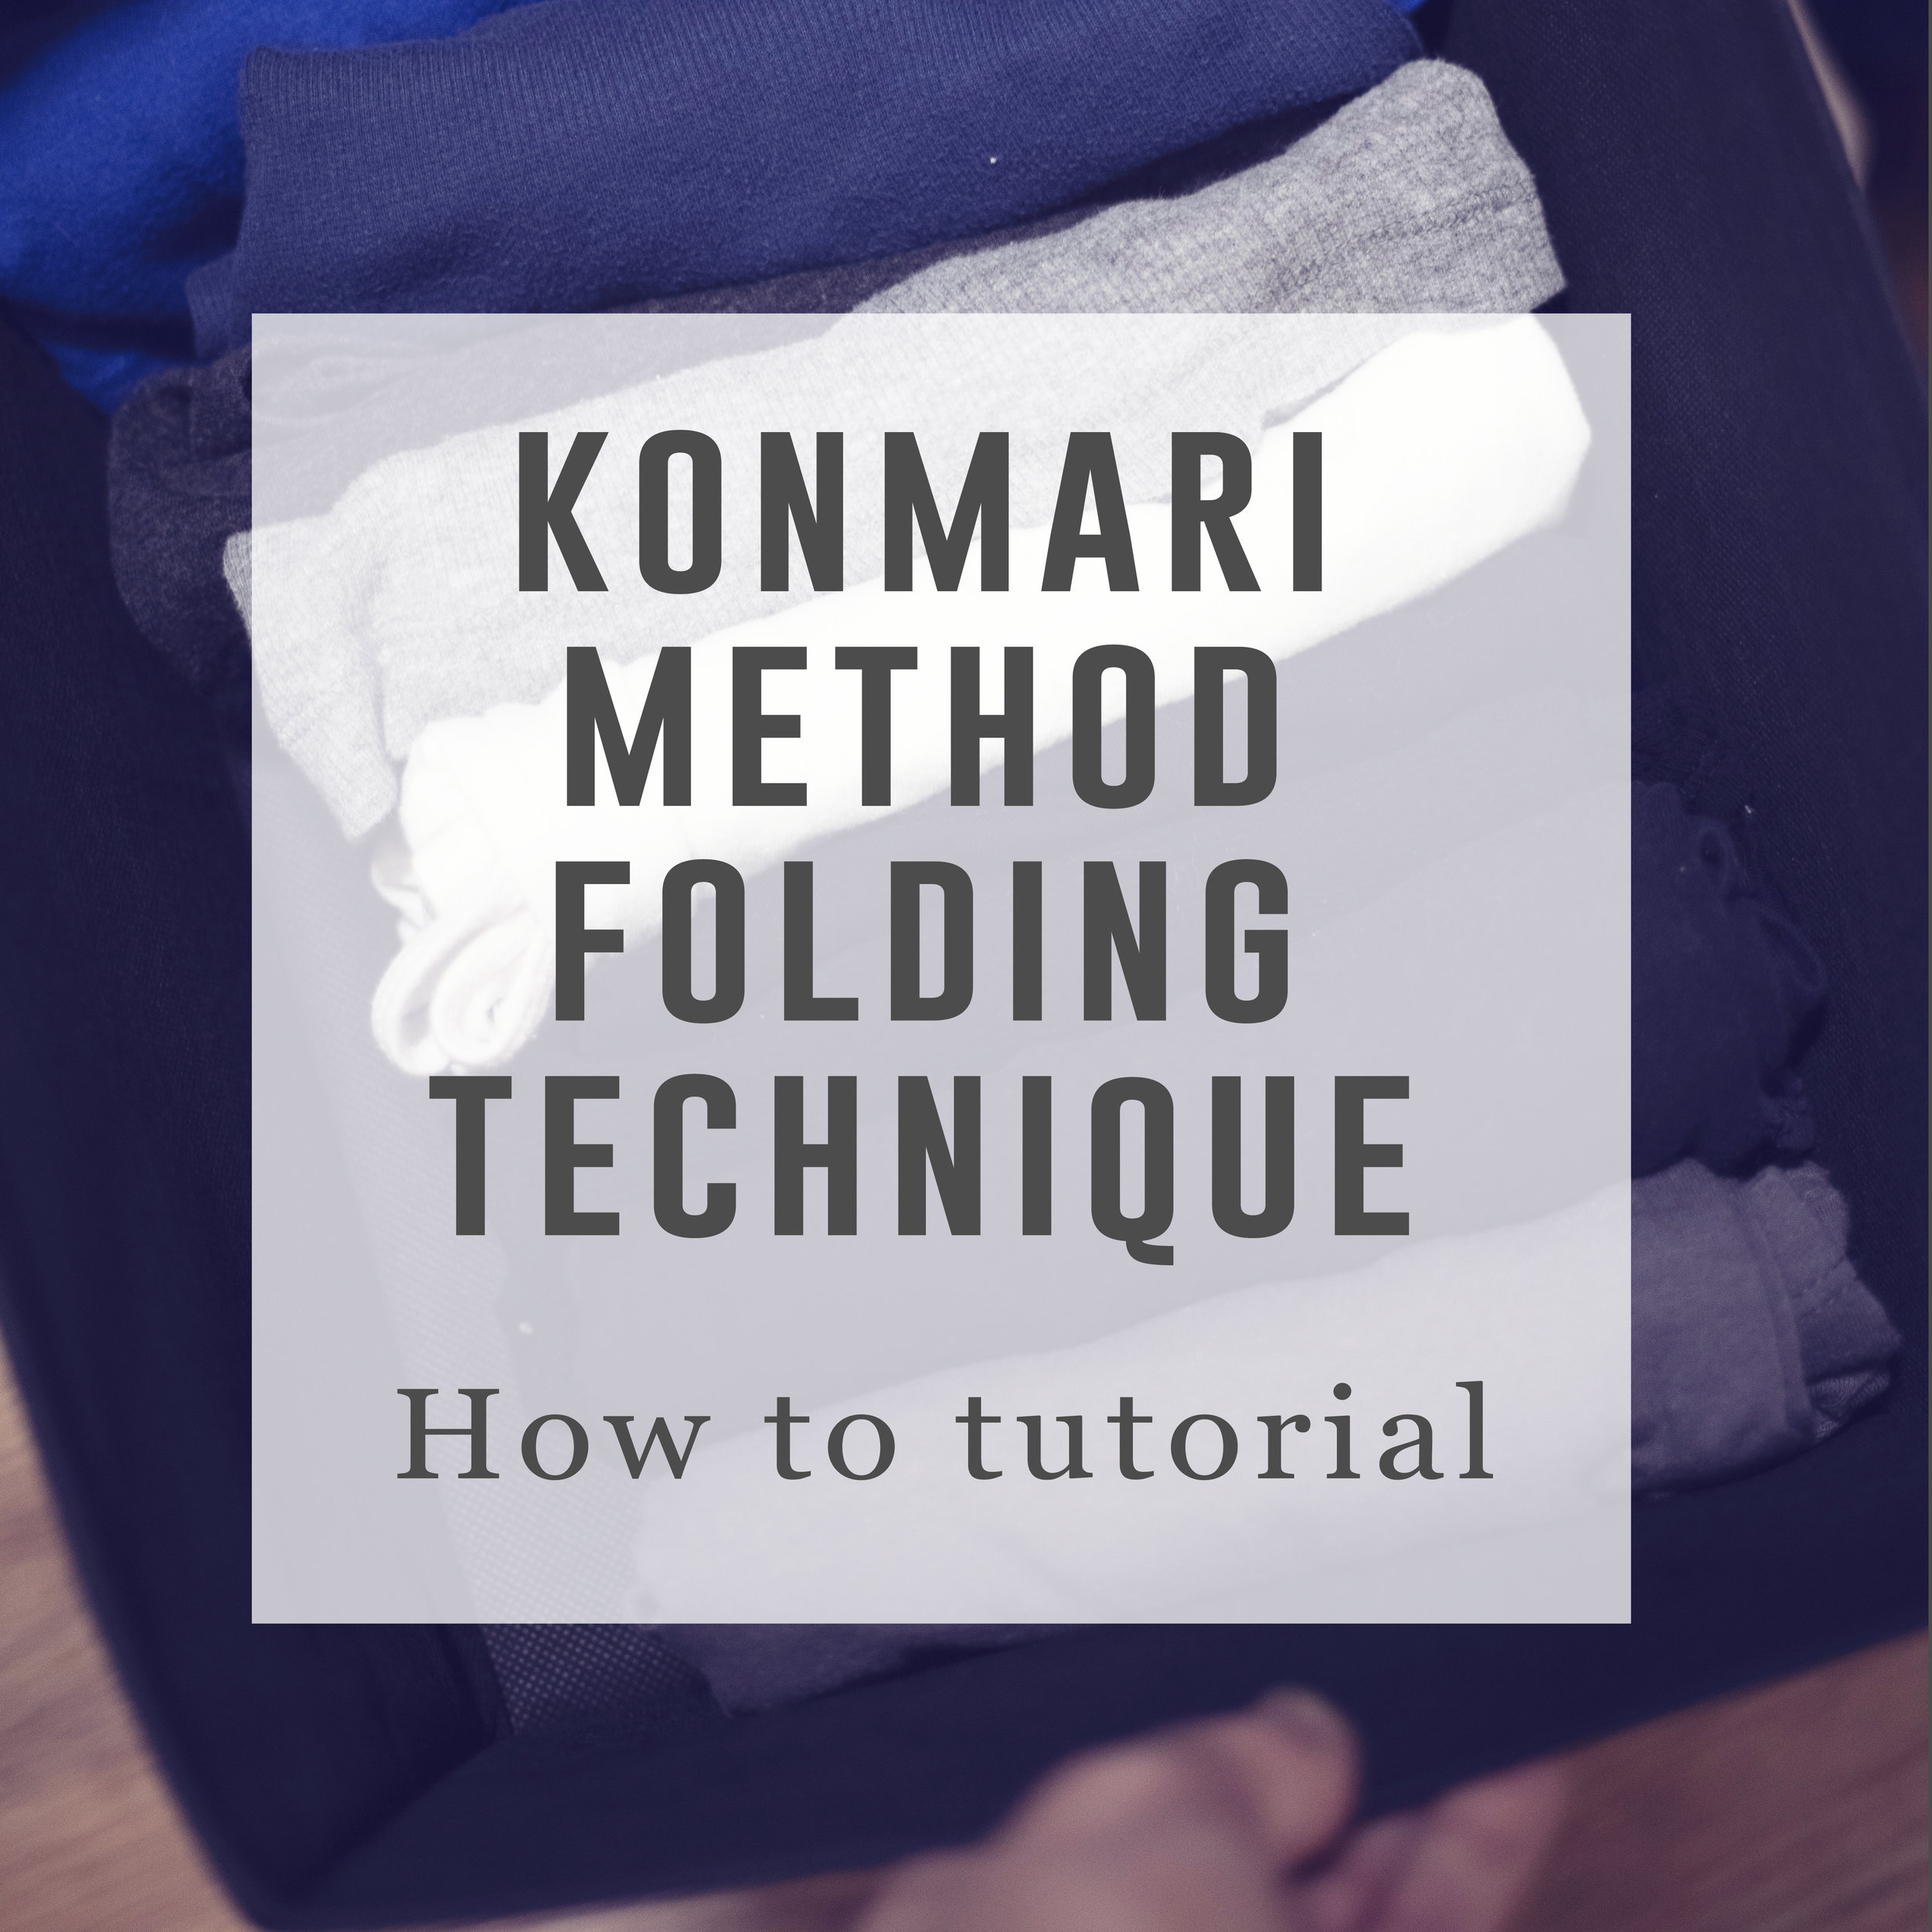 konmari-method-featured-image.jpg